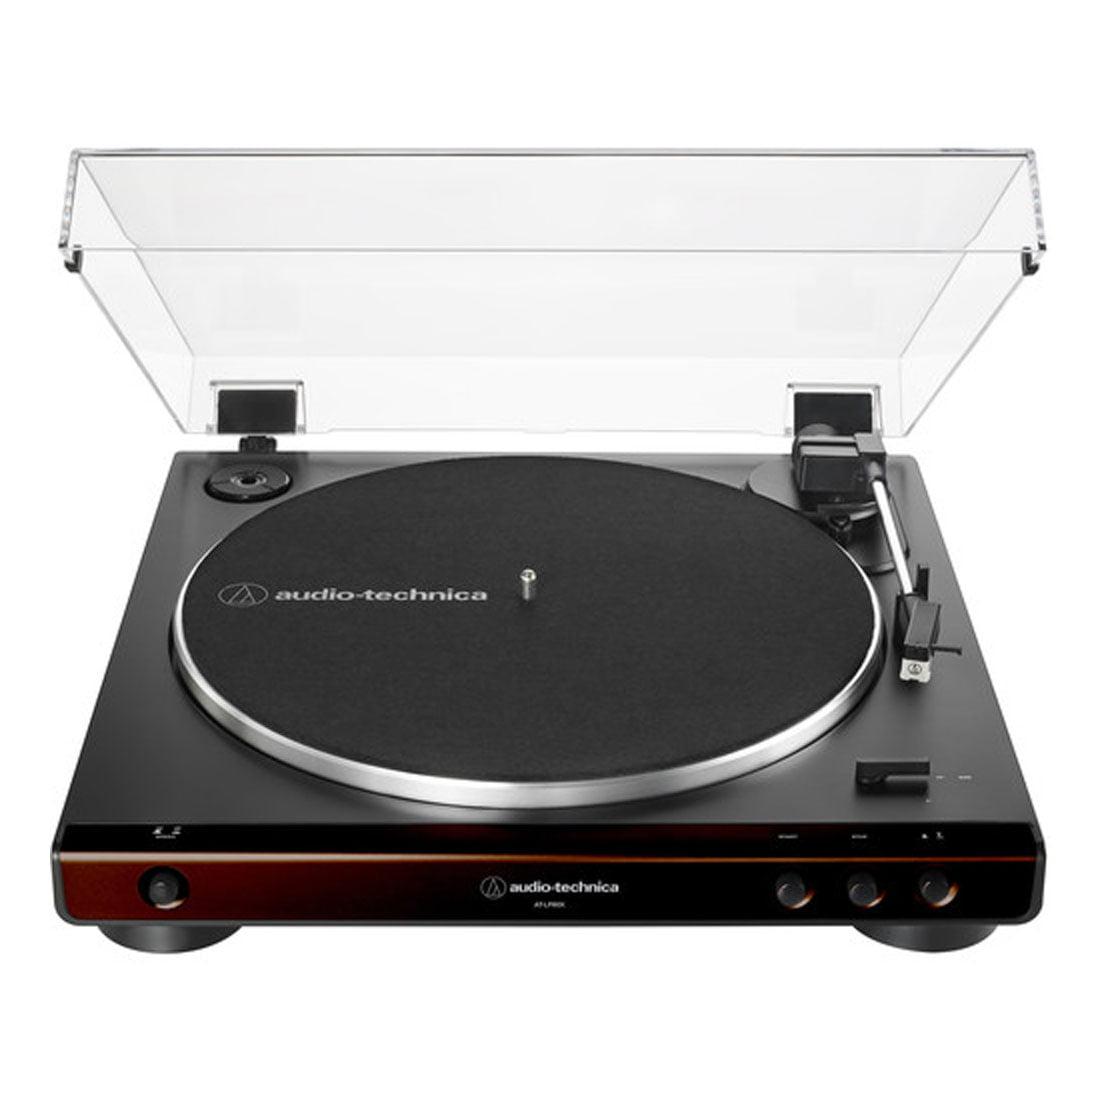 Audio-Technica AT-LP60X-BN